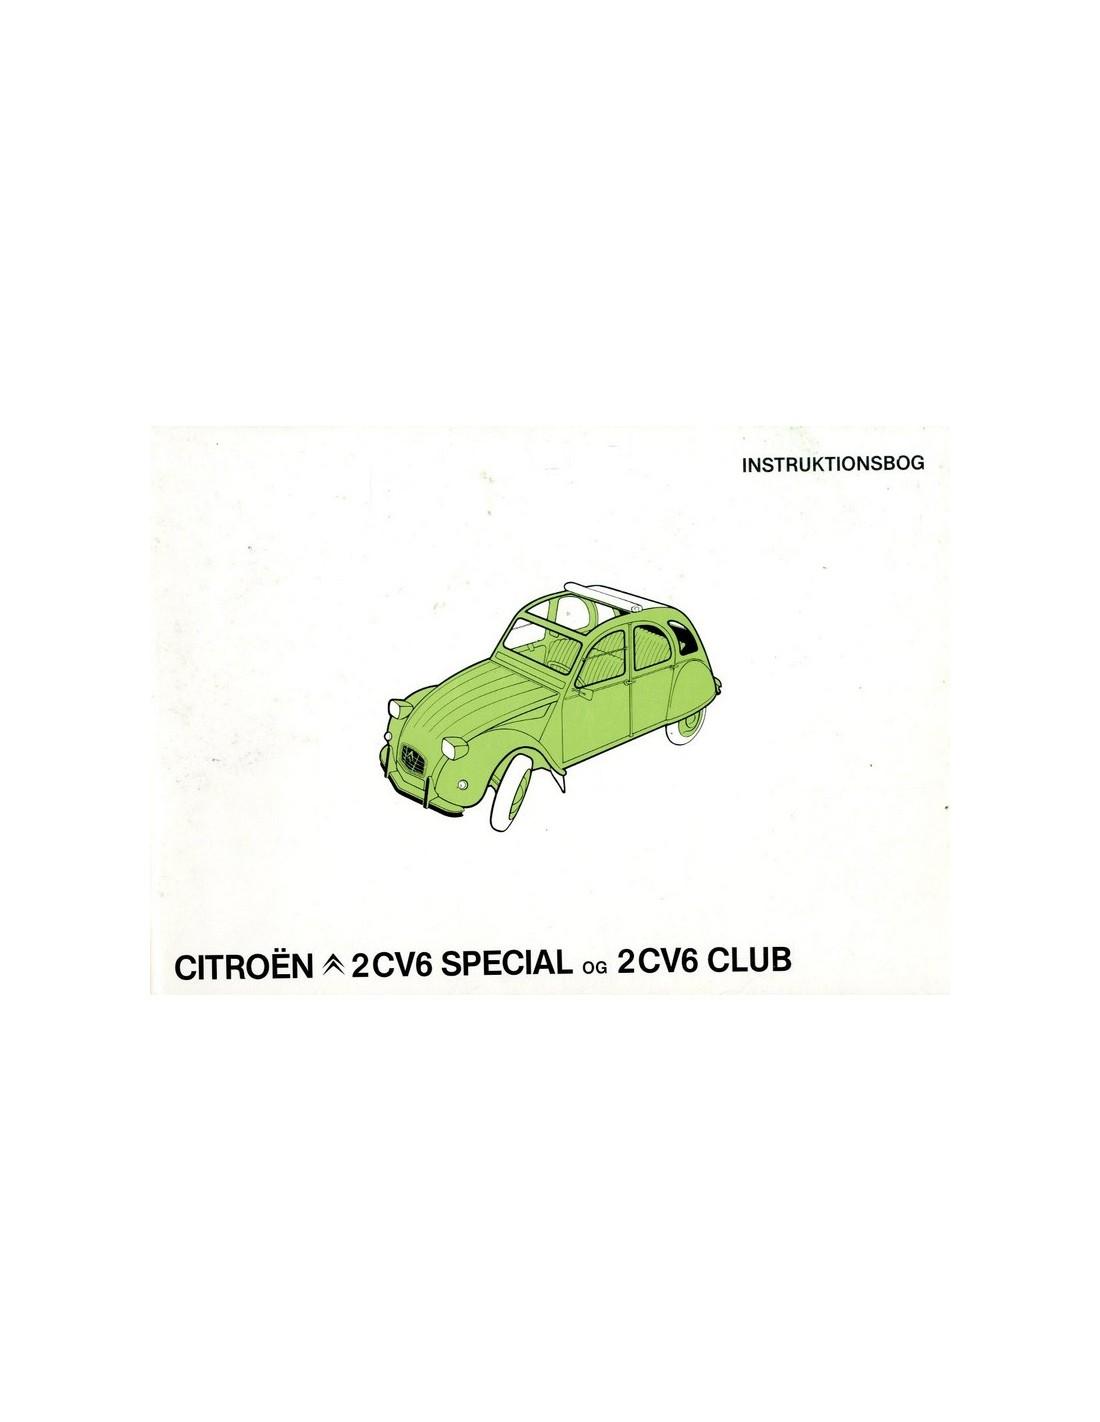 Renault Owners Club Of North America: 1981 CITROEN 2CV6 SPECIAL & CLUB OWNERS MANUAL HANDBOOK DANISH